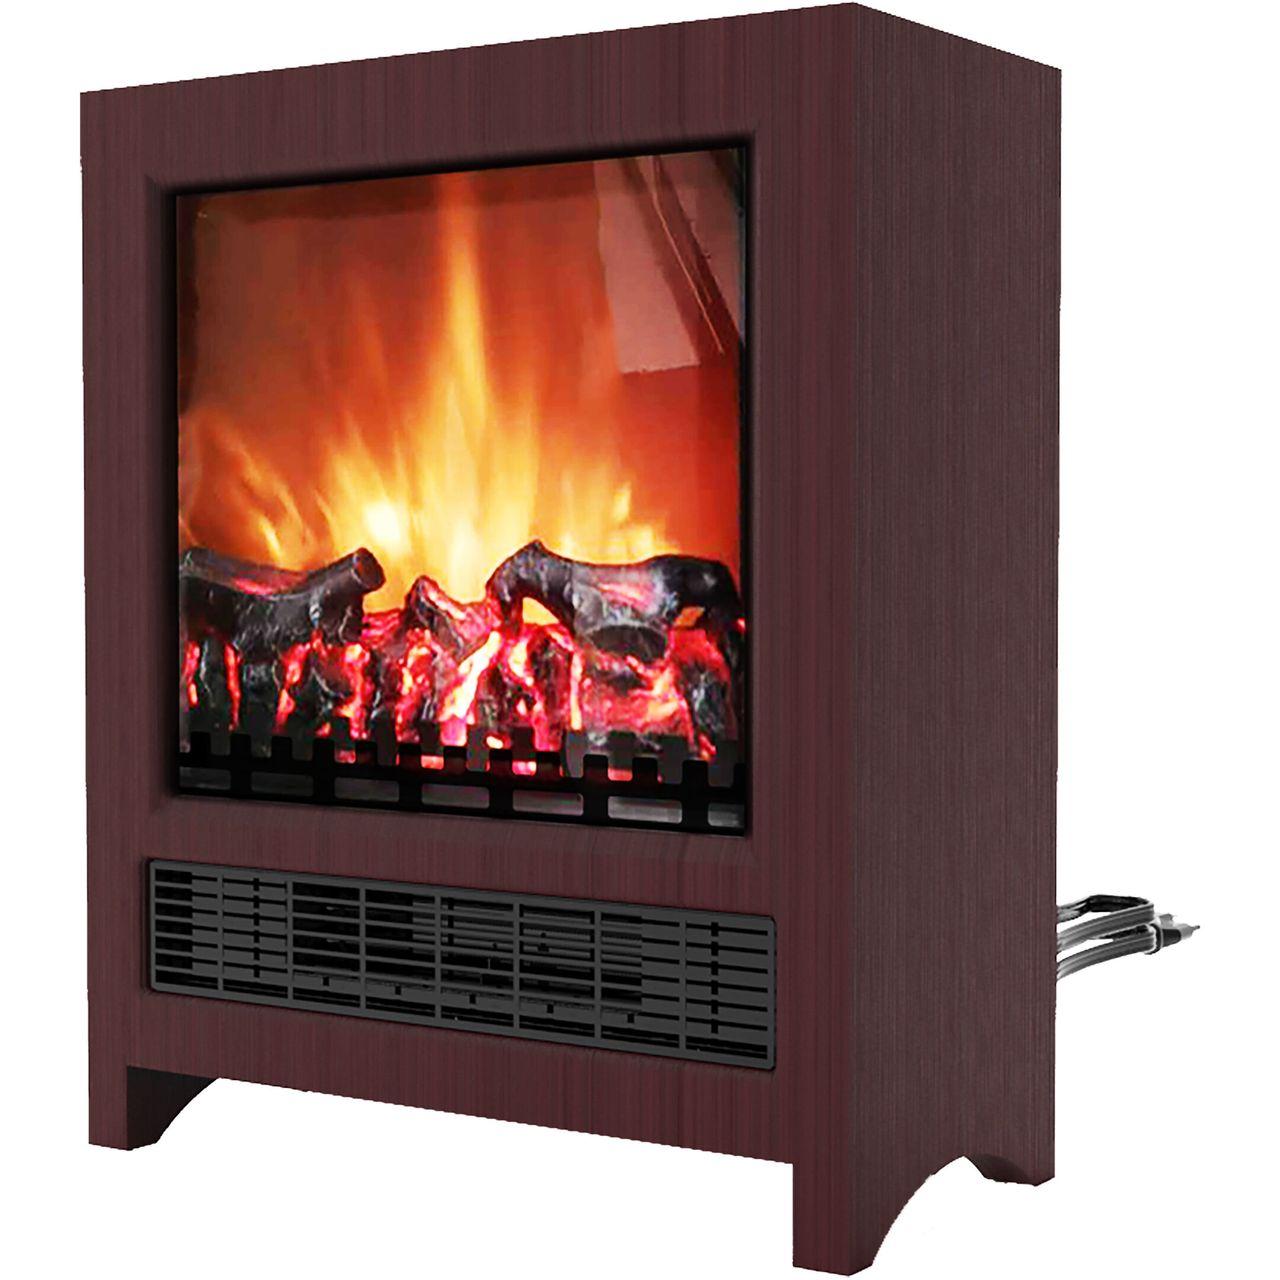 "Cambridge 19"" Freestanding 4606 BTU Electric Fireplace - Mahogany"